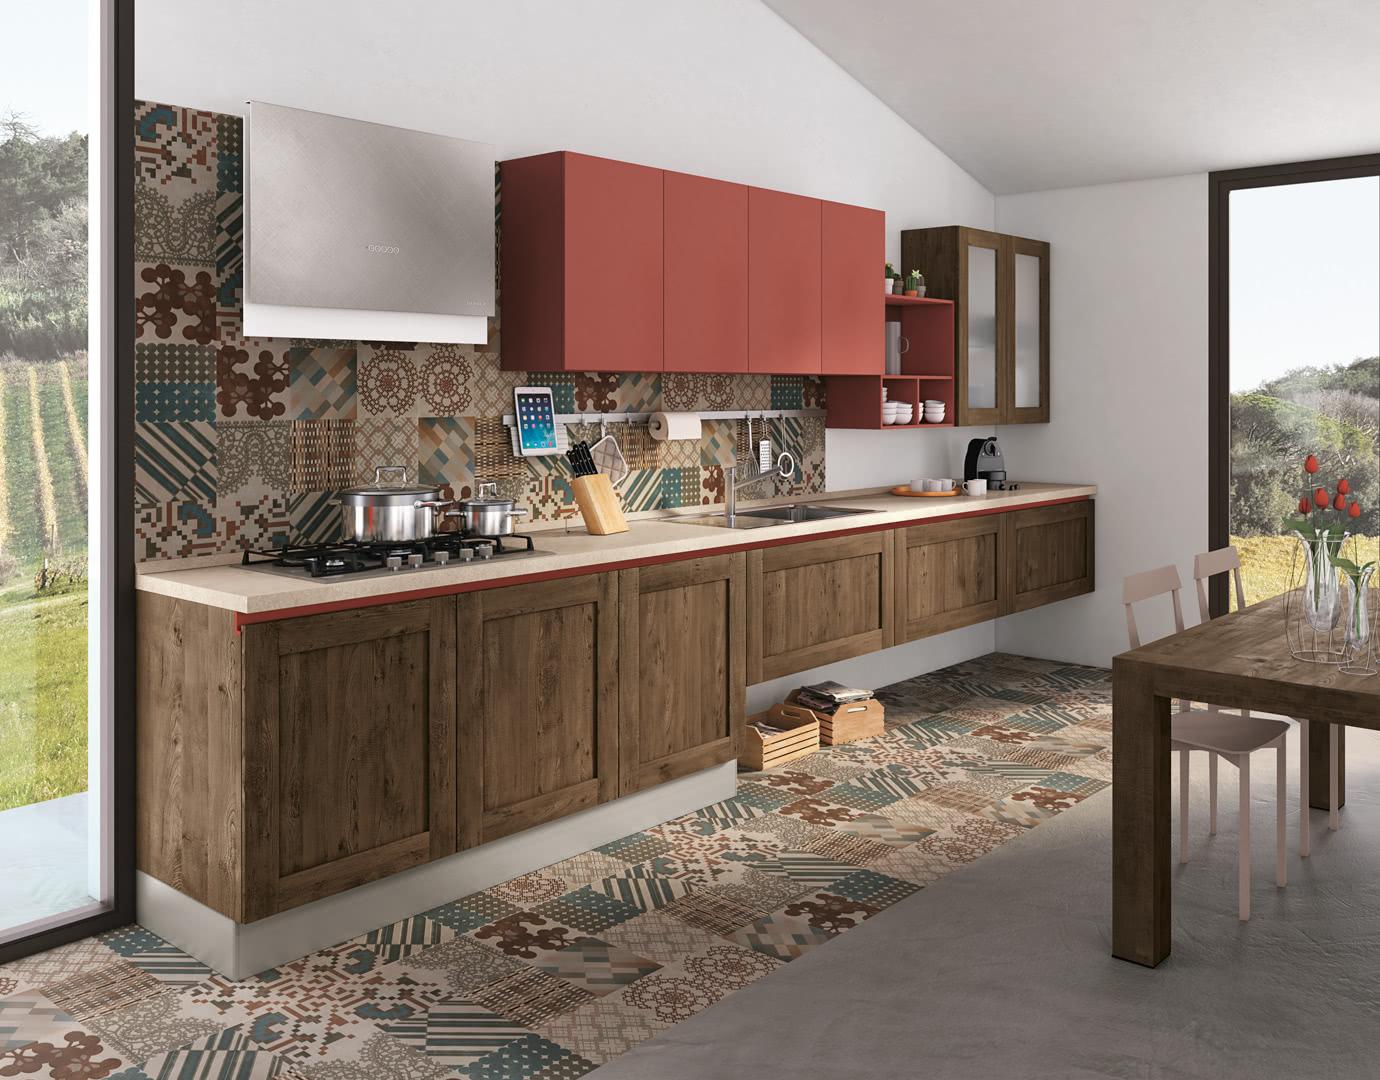 1749_kyra-telaio-cucina-ambientata-8